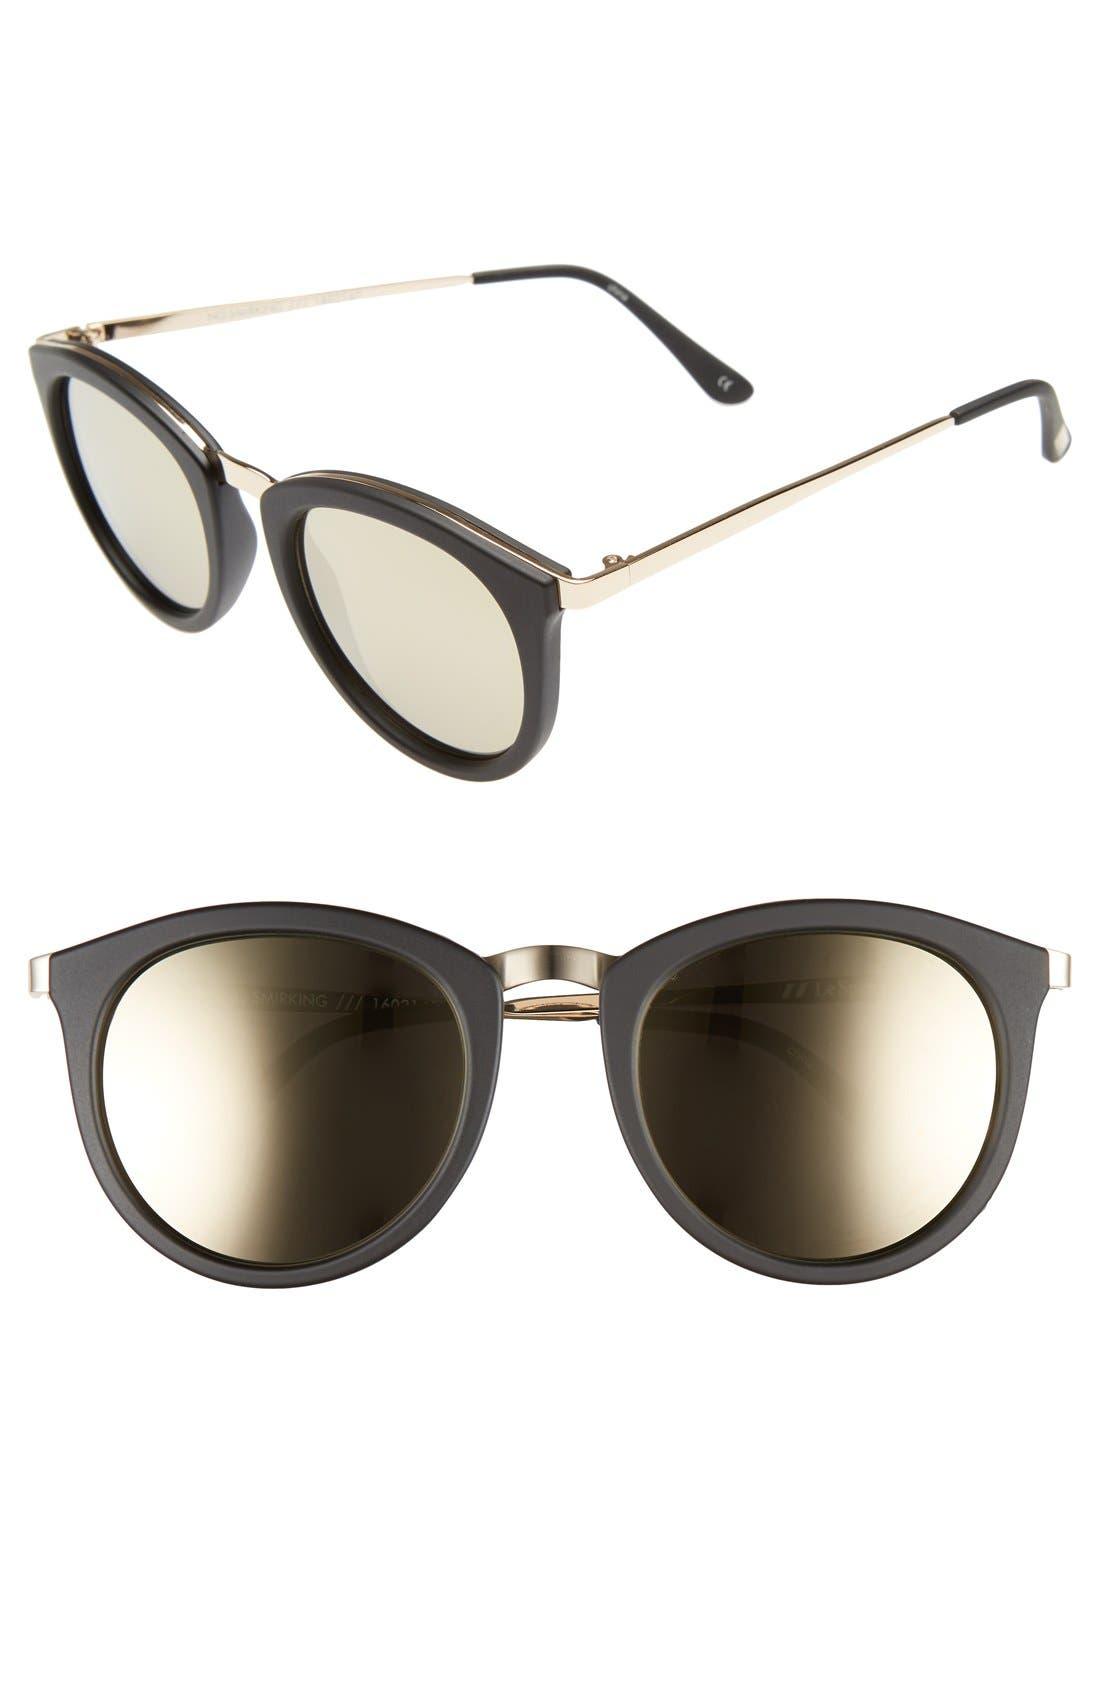 Le Specs No Smirking Limited 50mm Sunglasses